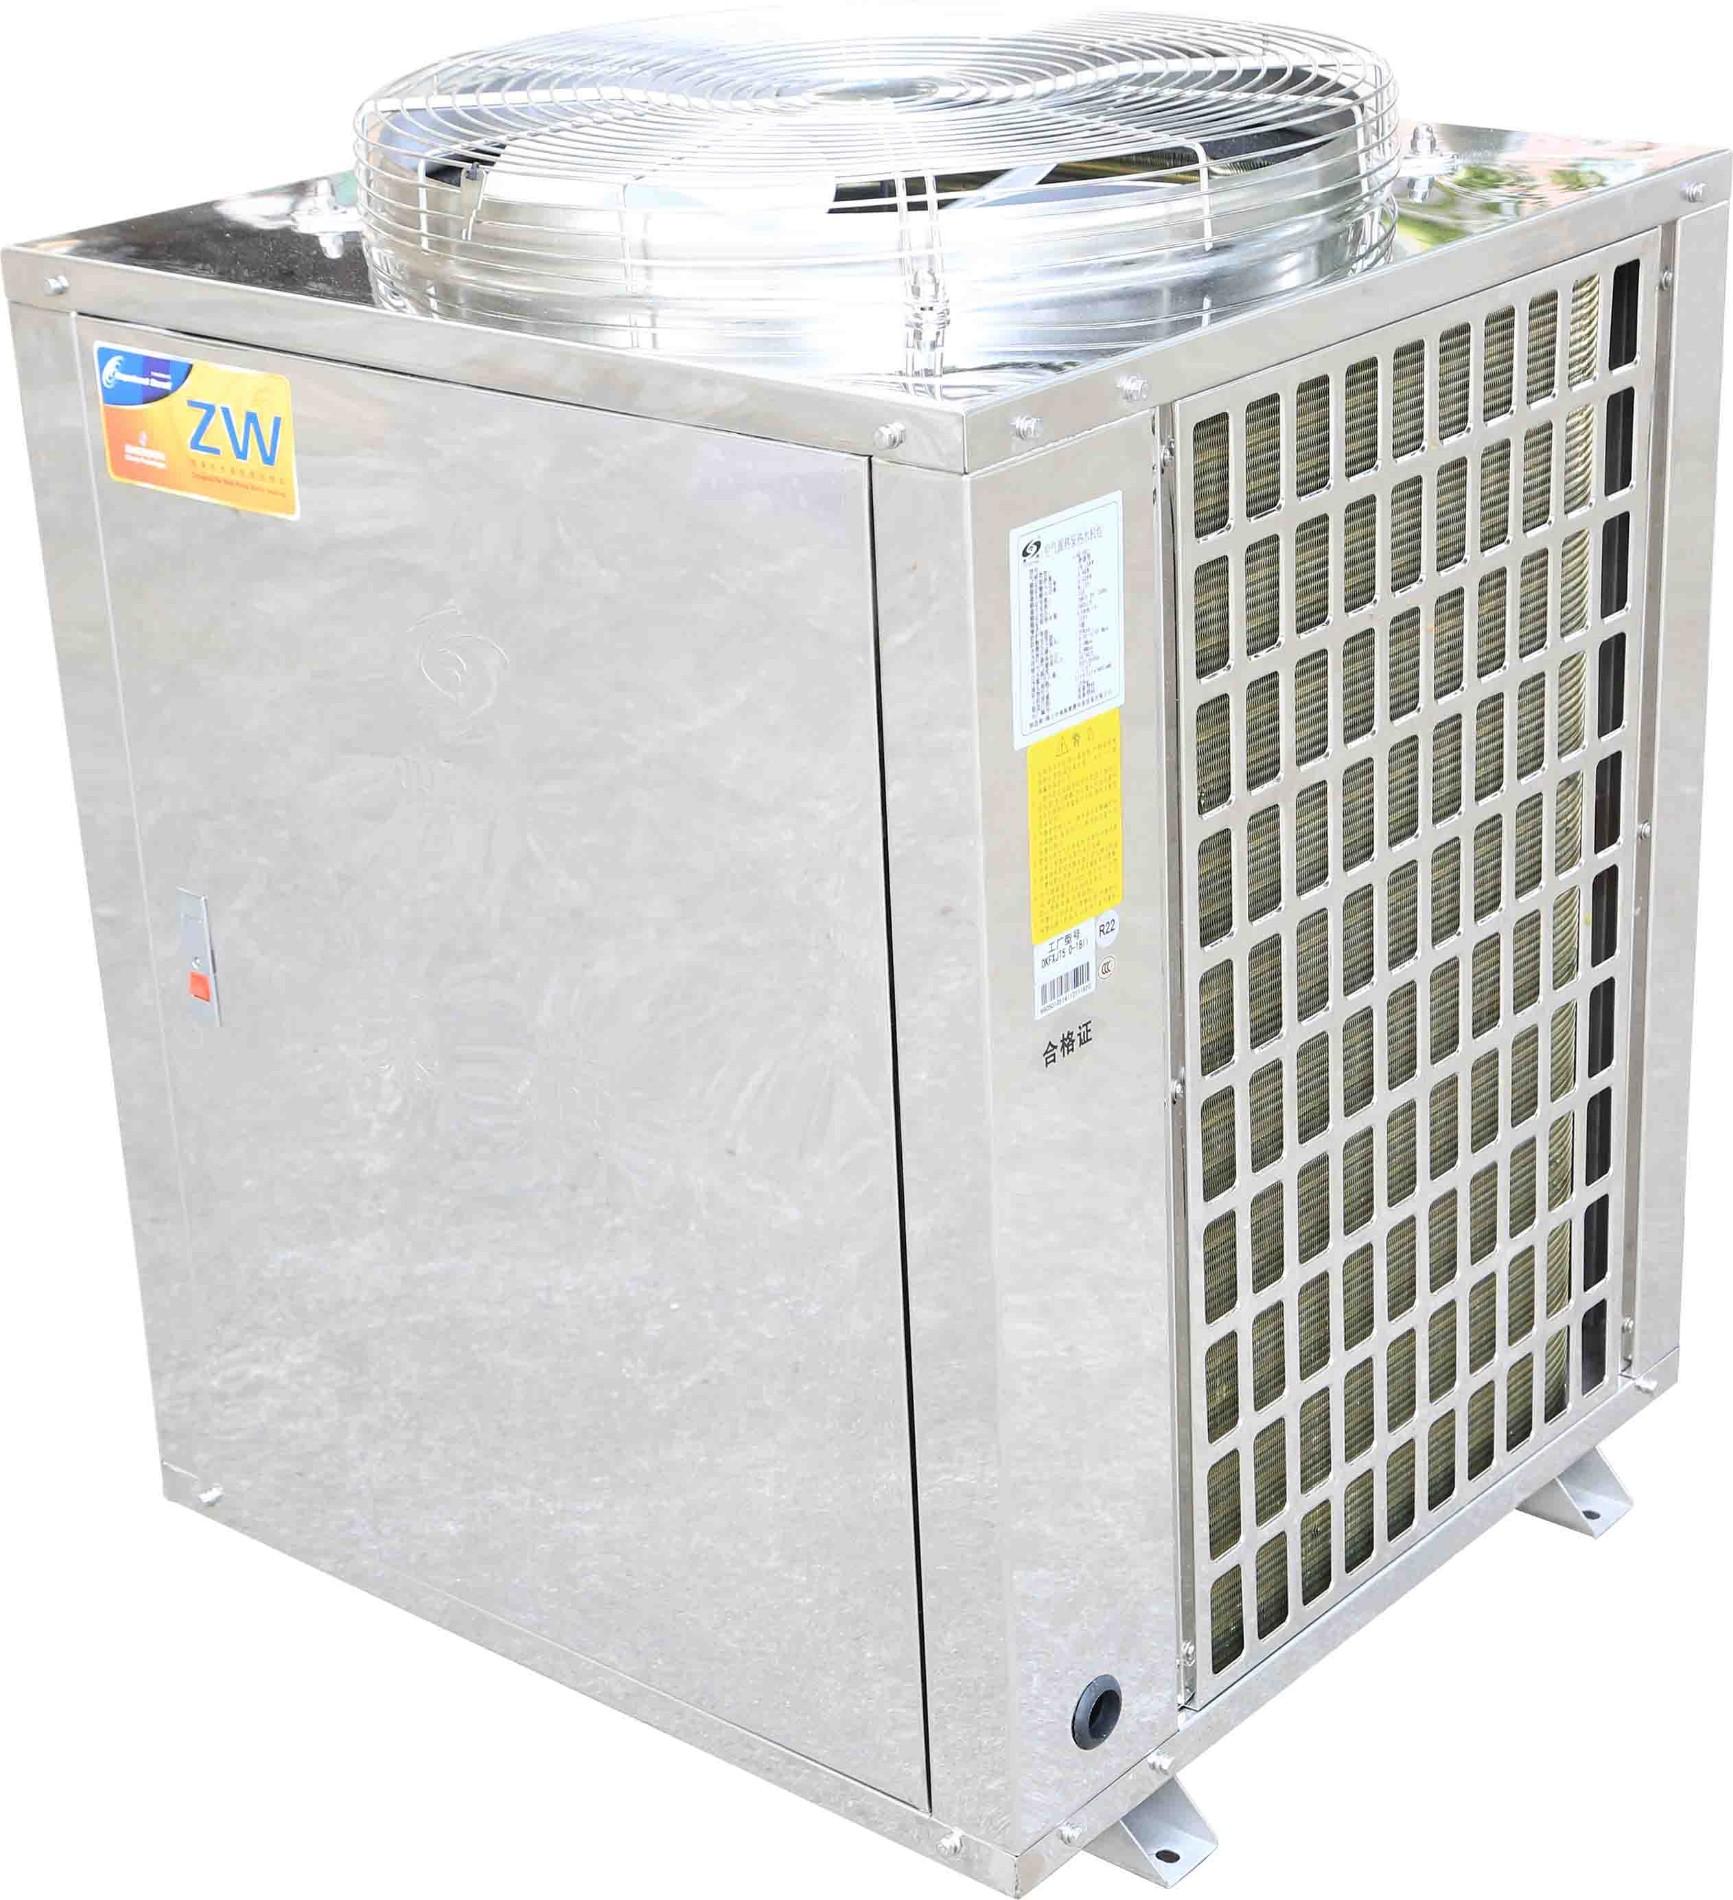 High quality energy saving techology  Hotel Heating Pump Quotes,China heat pump equipment Hotel Heating Pump Factory, pump equipmentHotel Heating Pump Purchasing